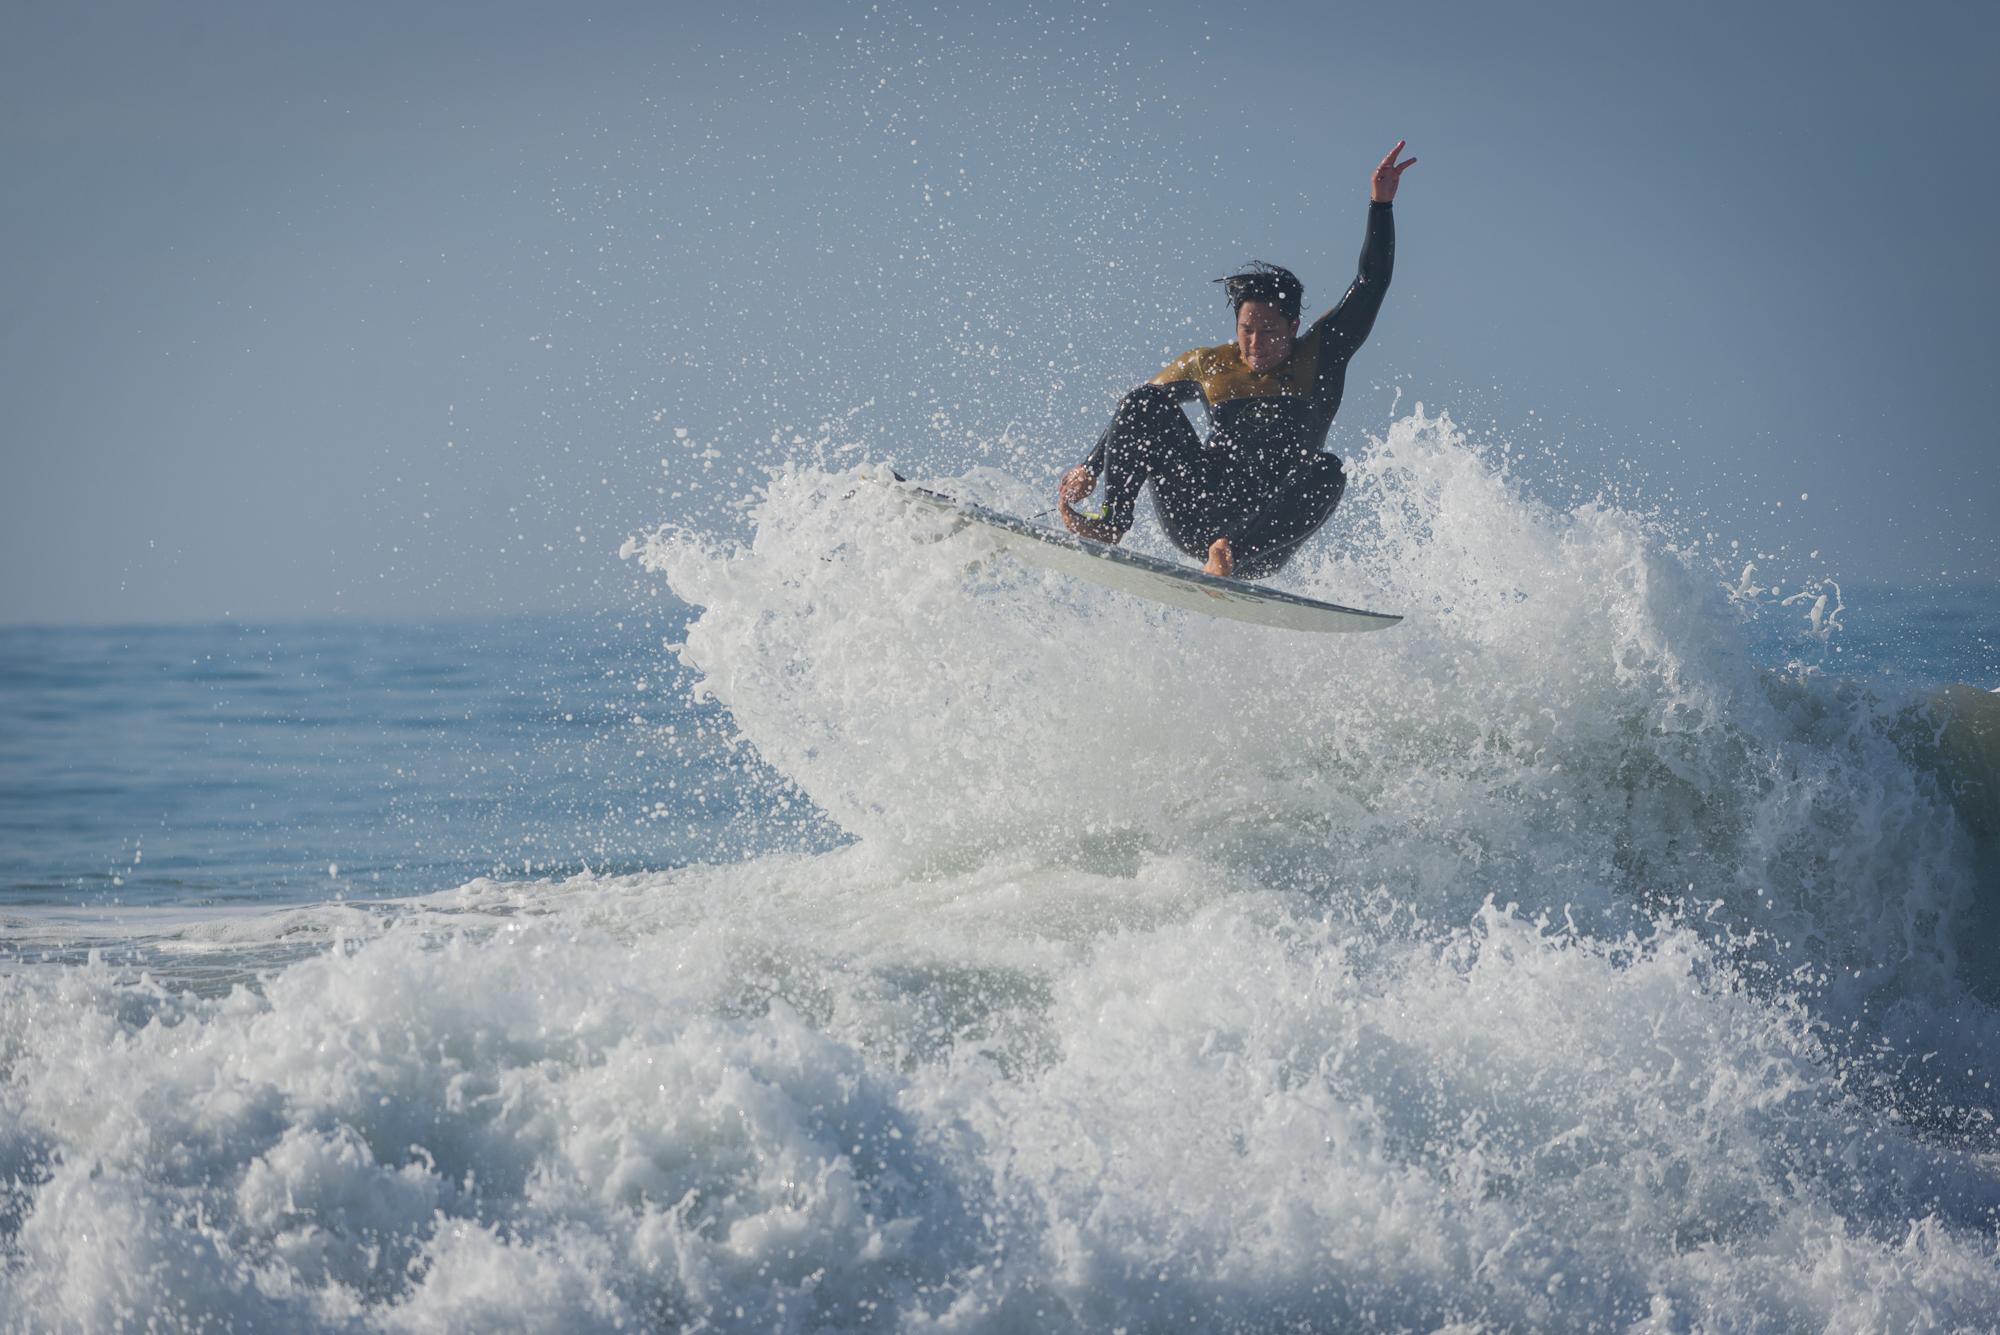 Surfer-Environmental-Portrait_Active-Lifestyle-Photography017.JPG